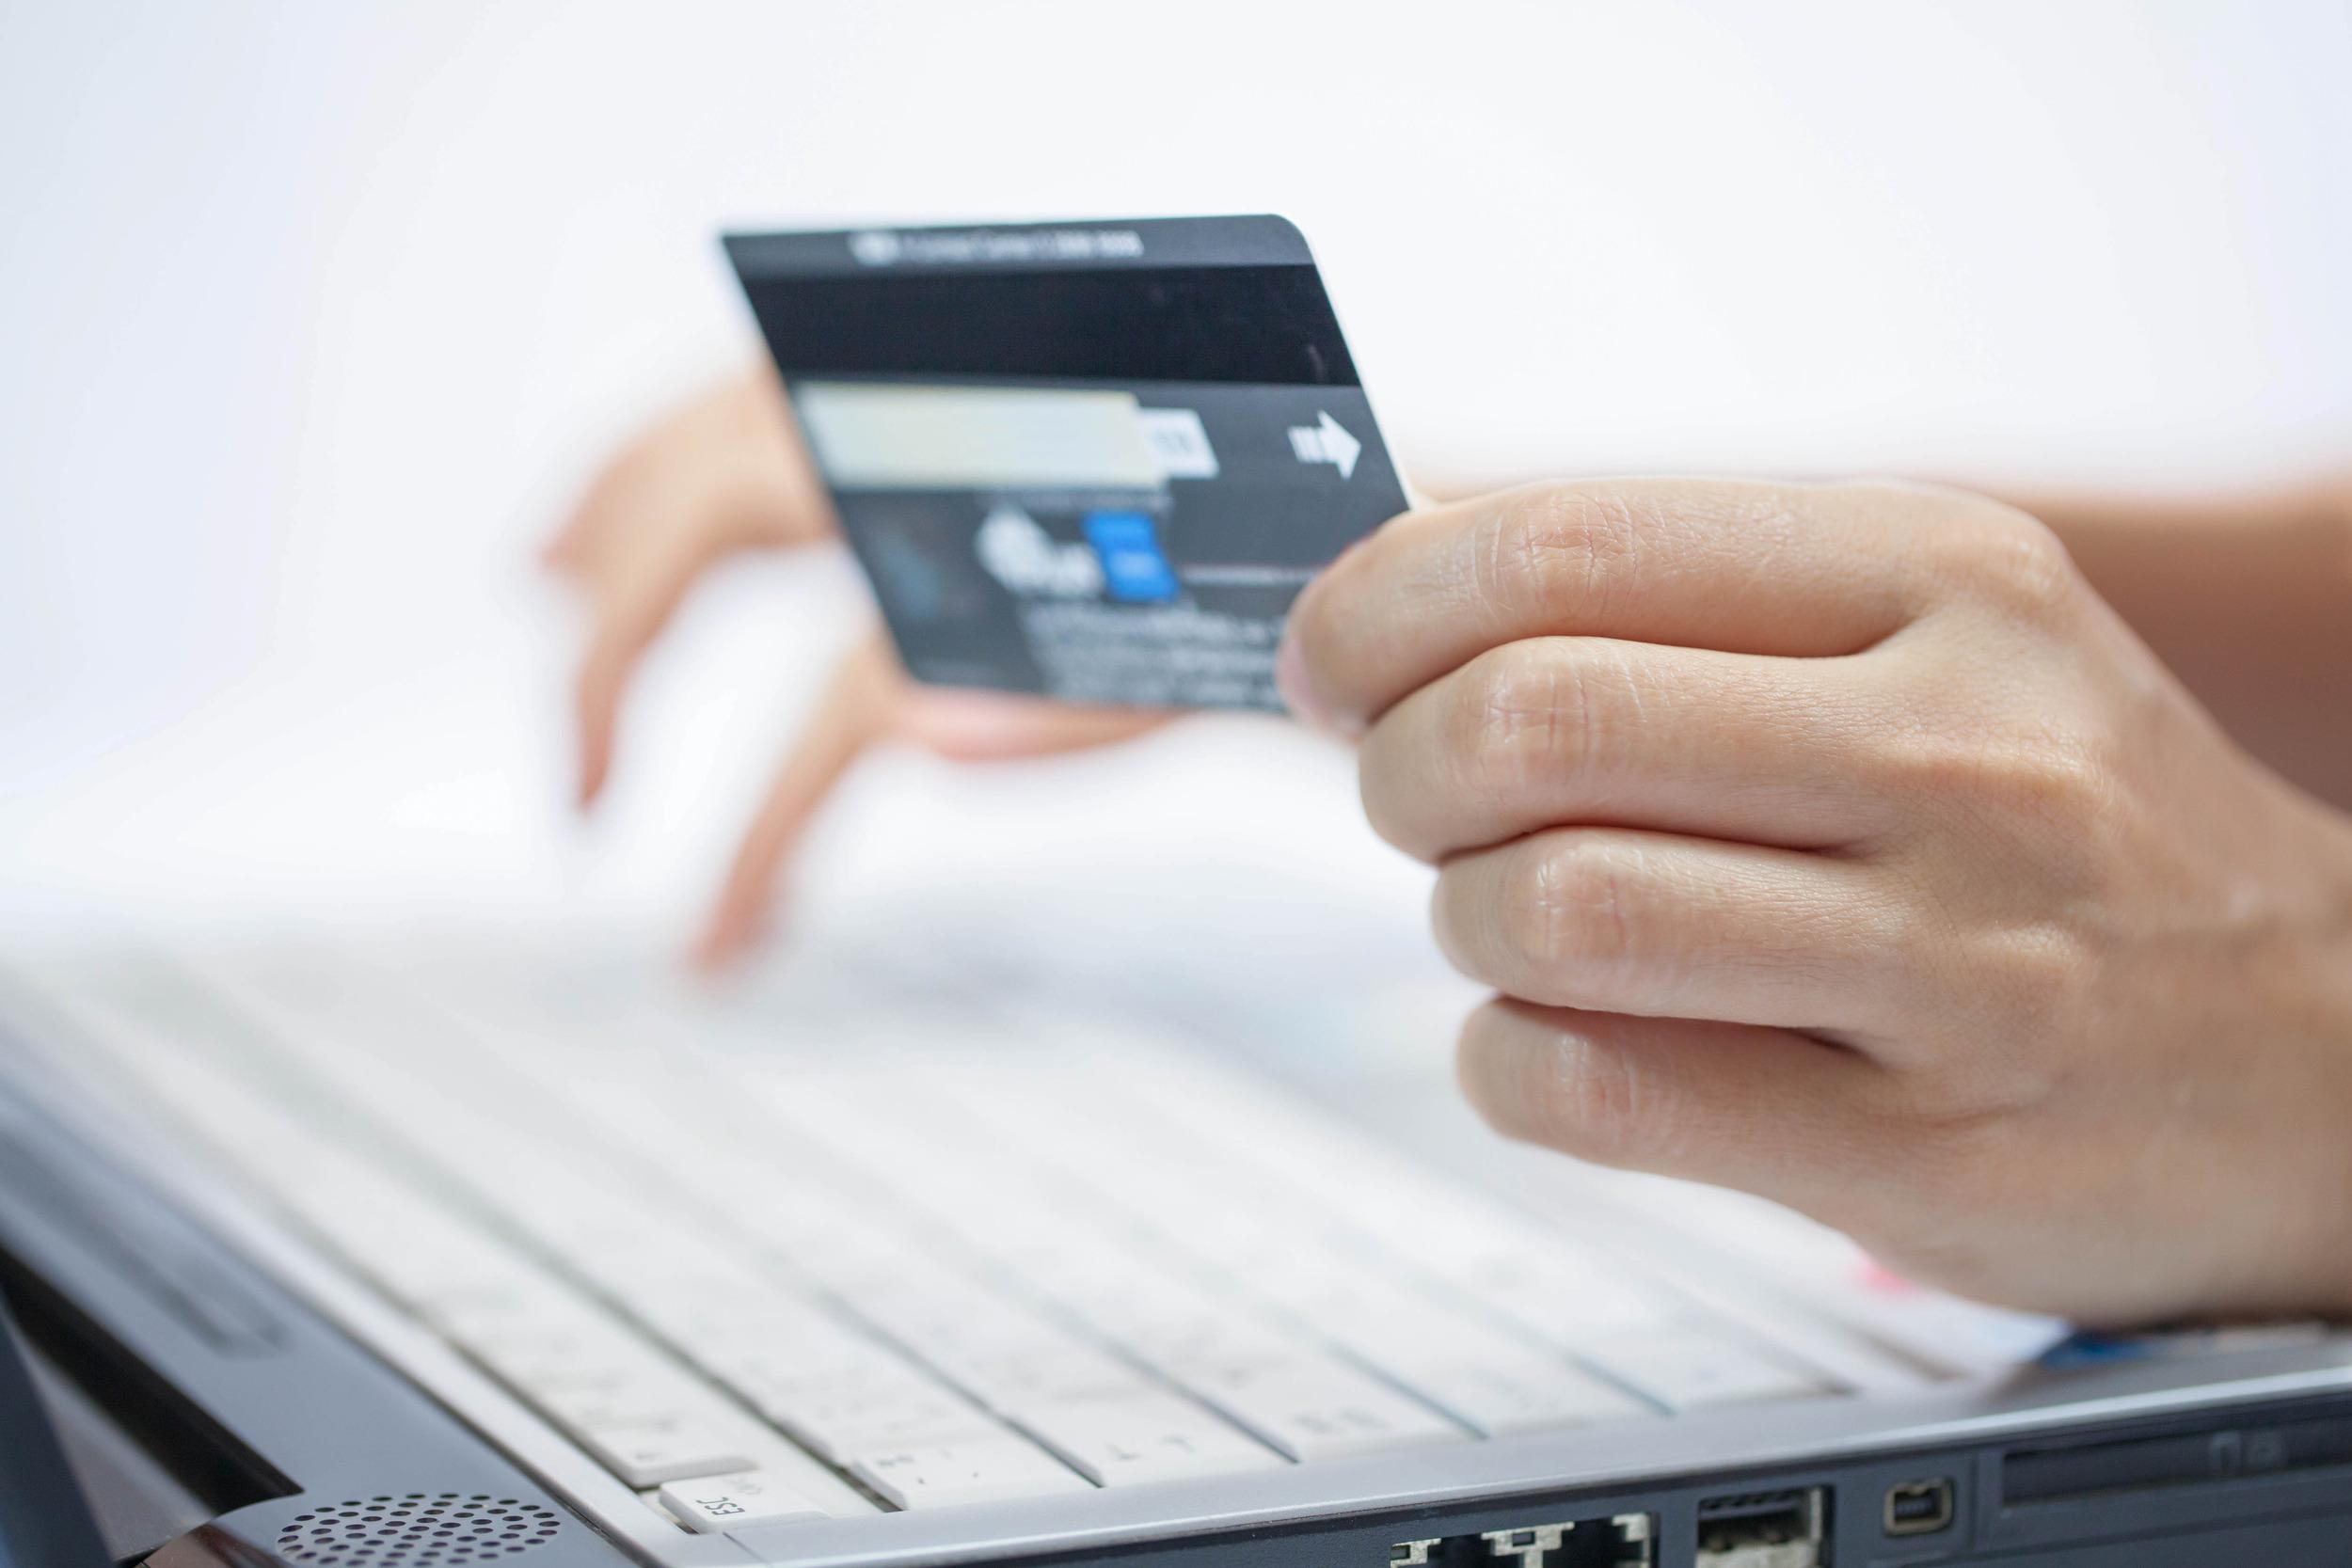 Credit Card Payment Keyboard.jpg